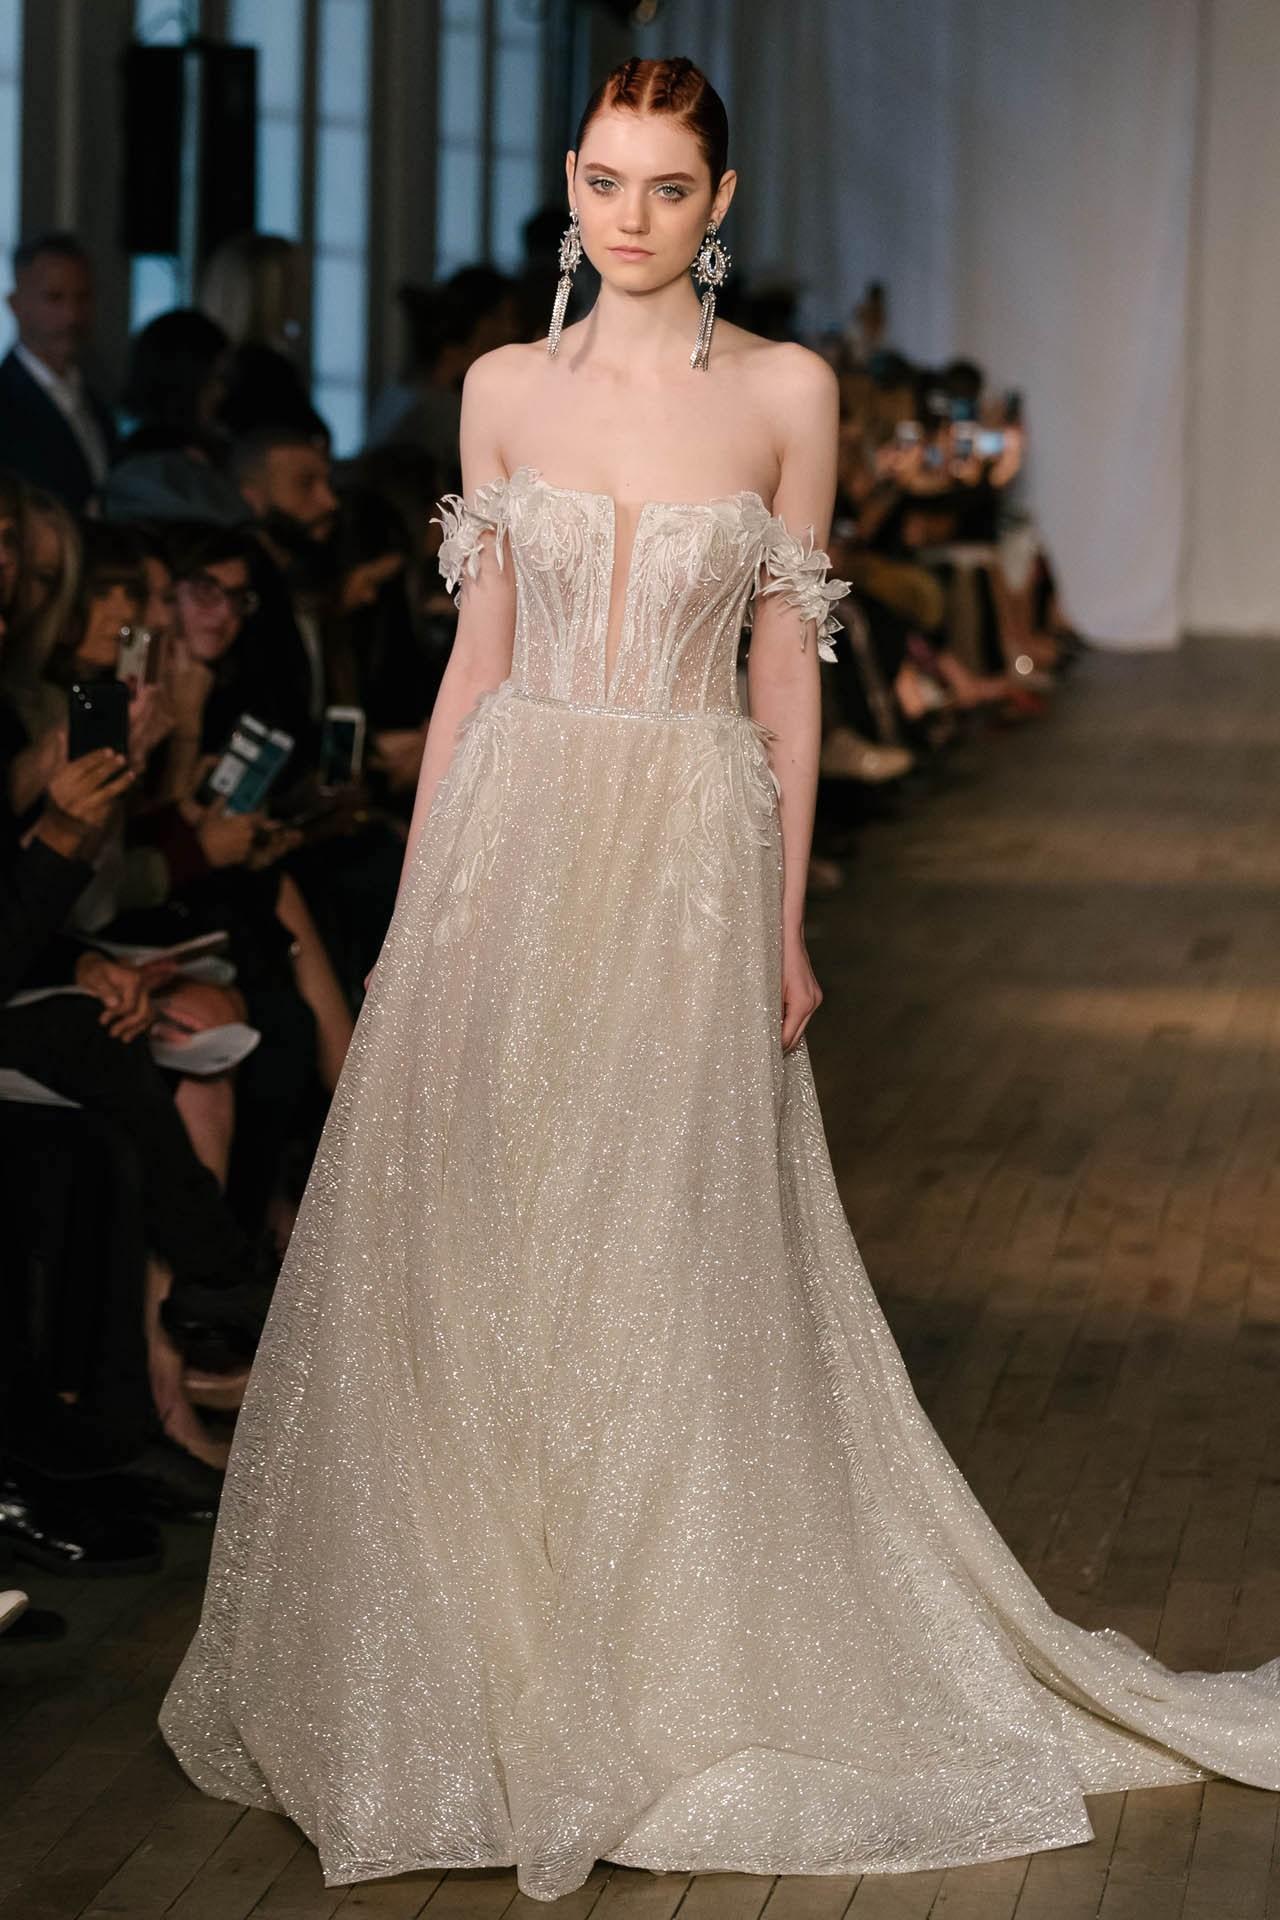 robe de mariée champagne longue col bardot